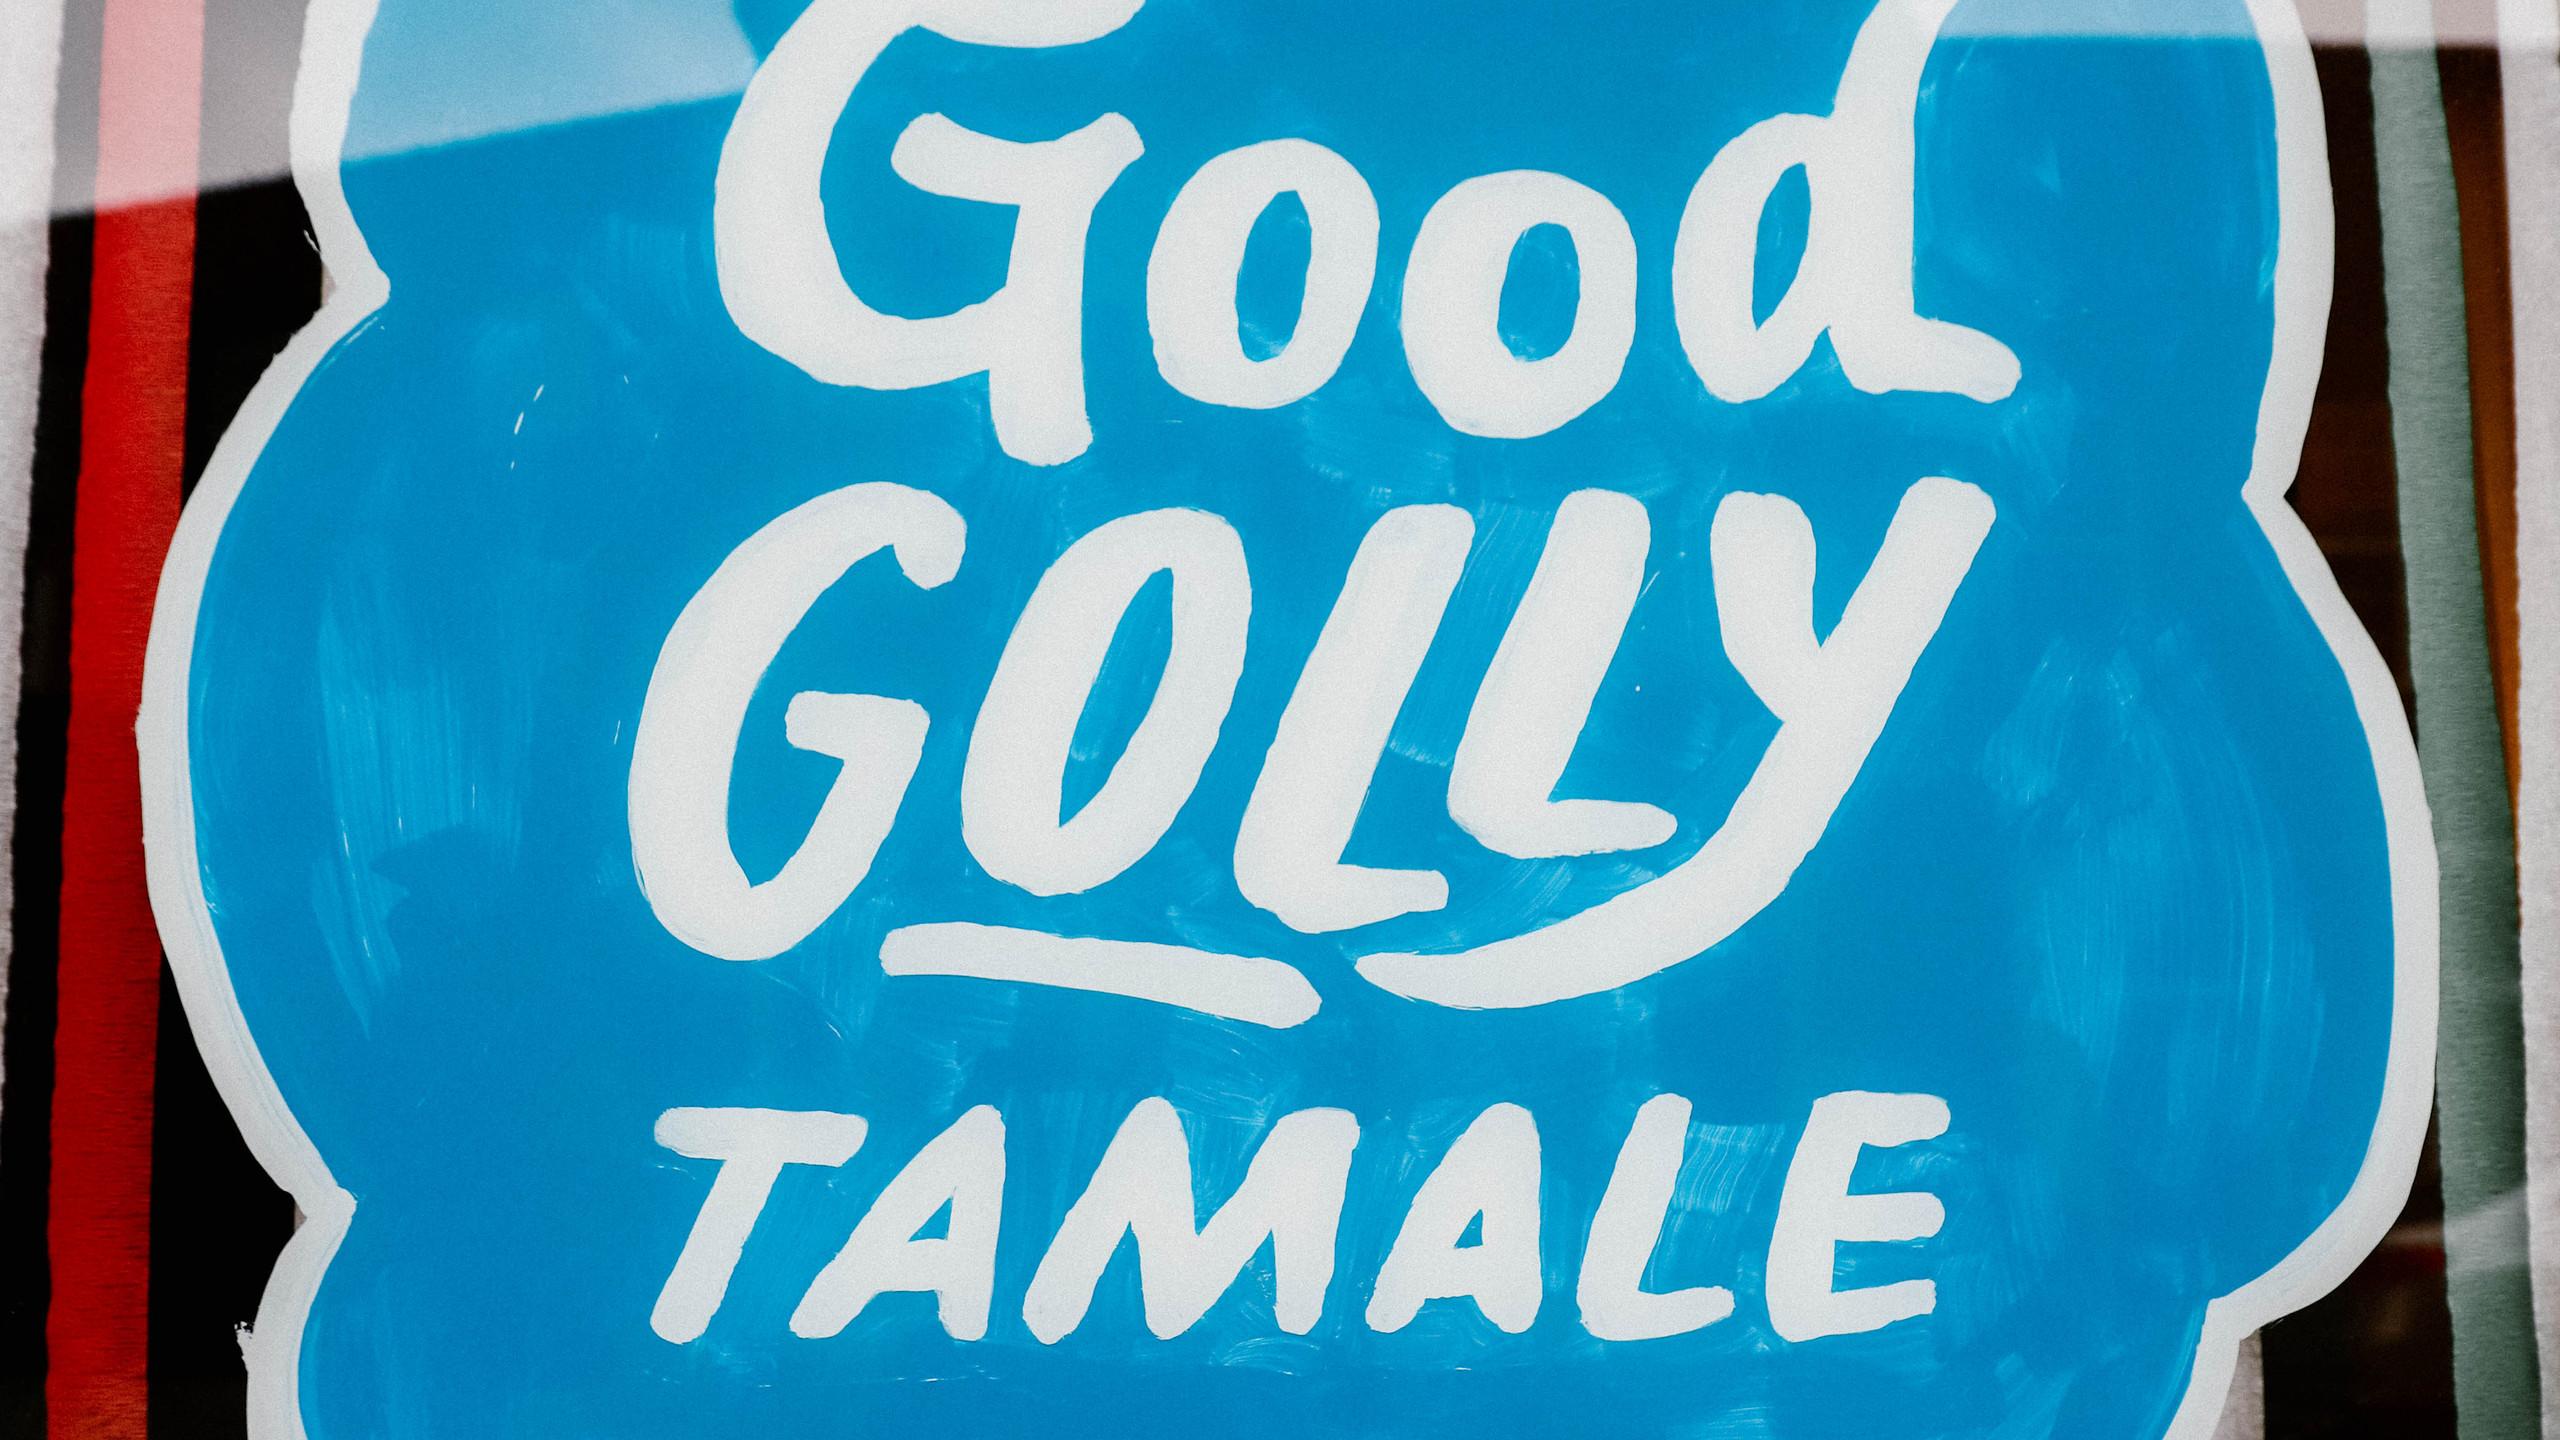 Good Golly Tamale